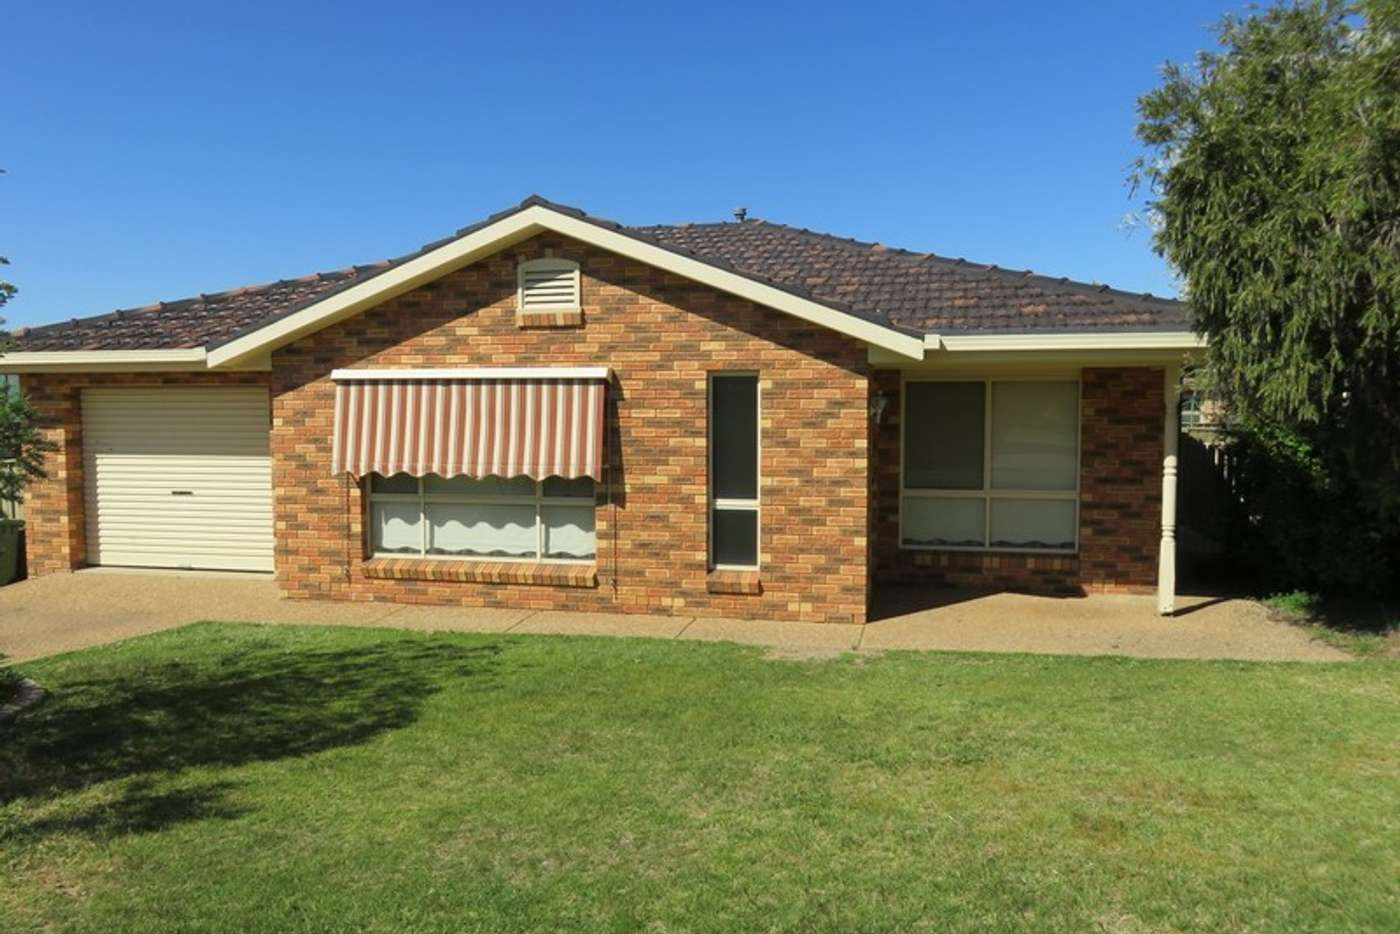 Main view of Homely unit listing, 2/21 Kimberley Drive, Wagga Wagga NSW 2650